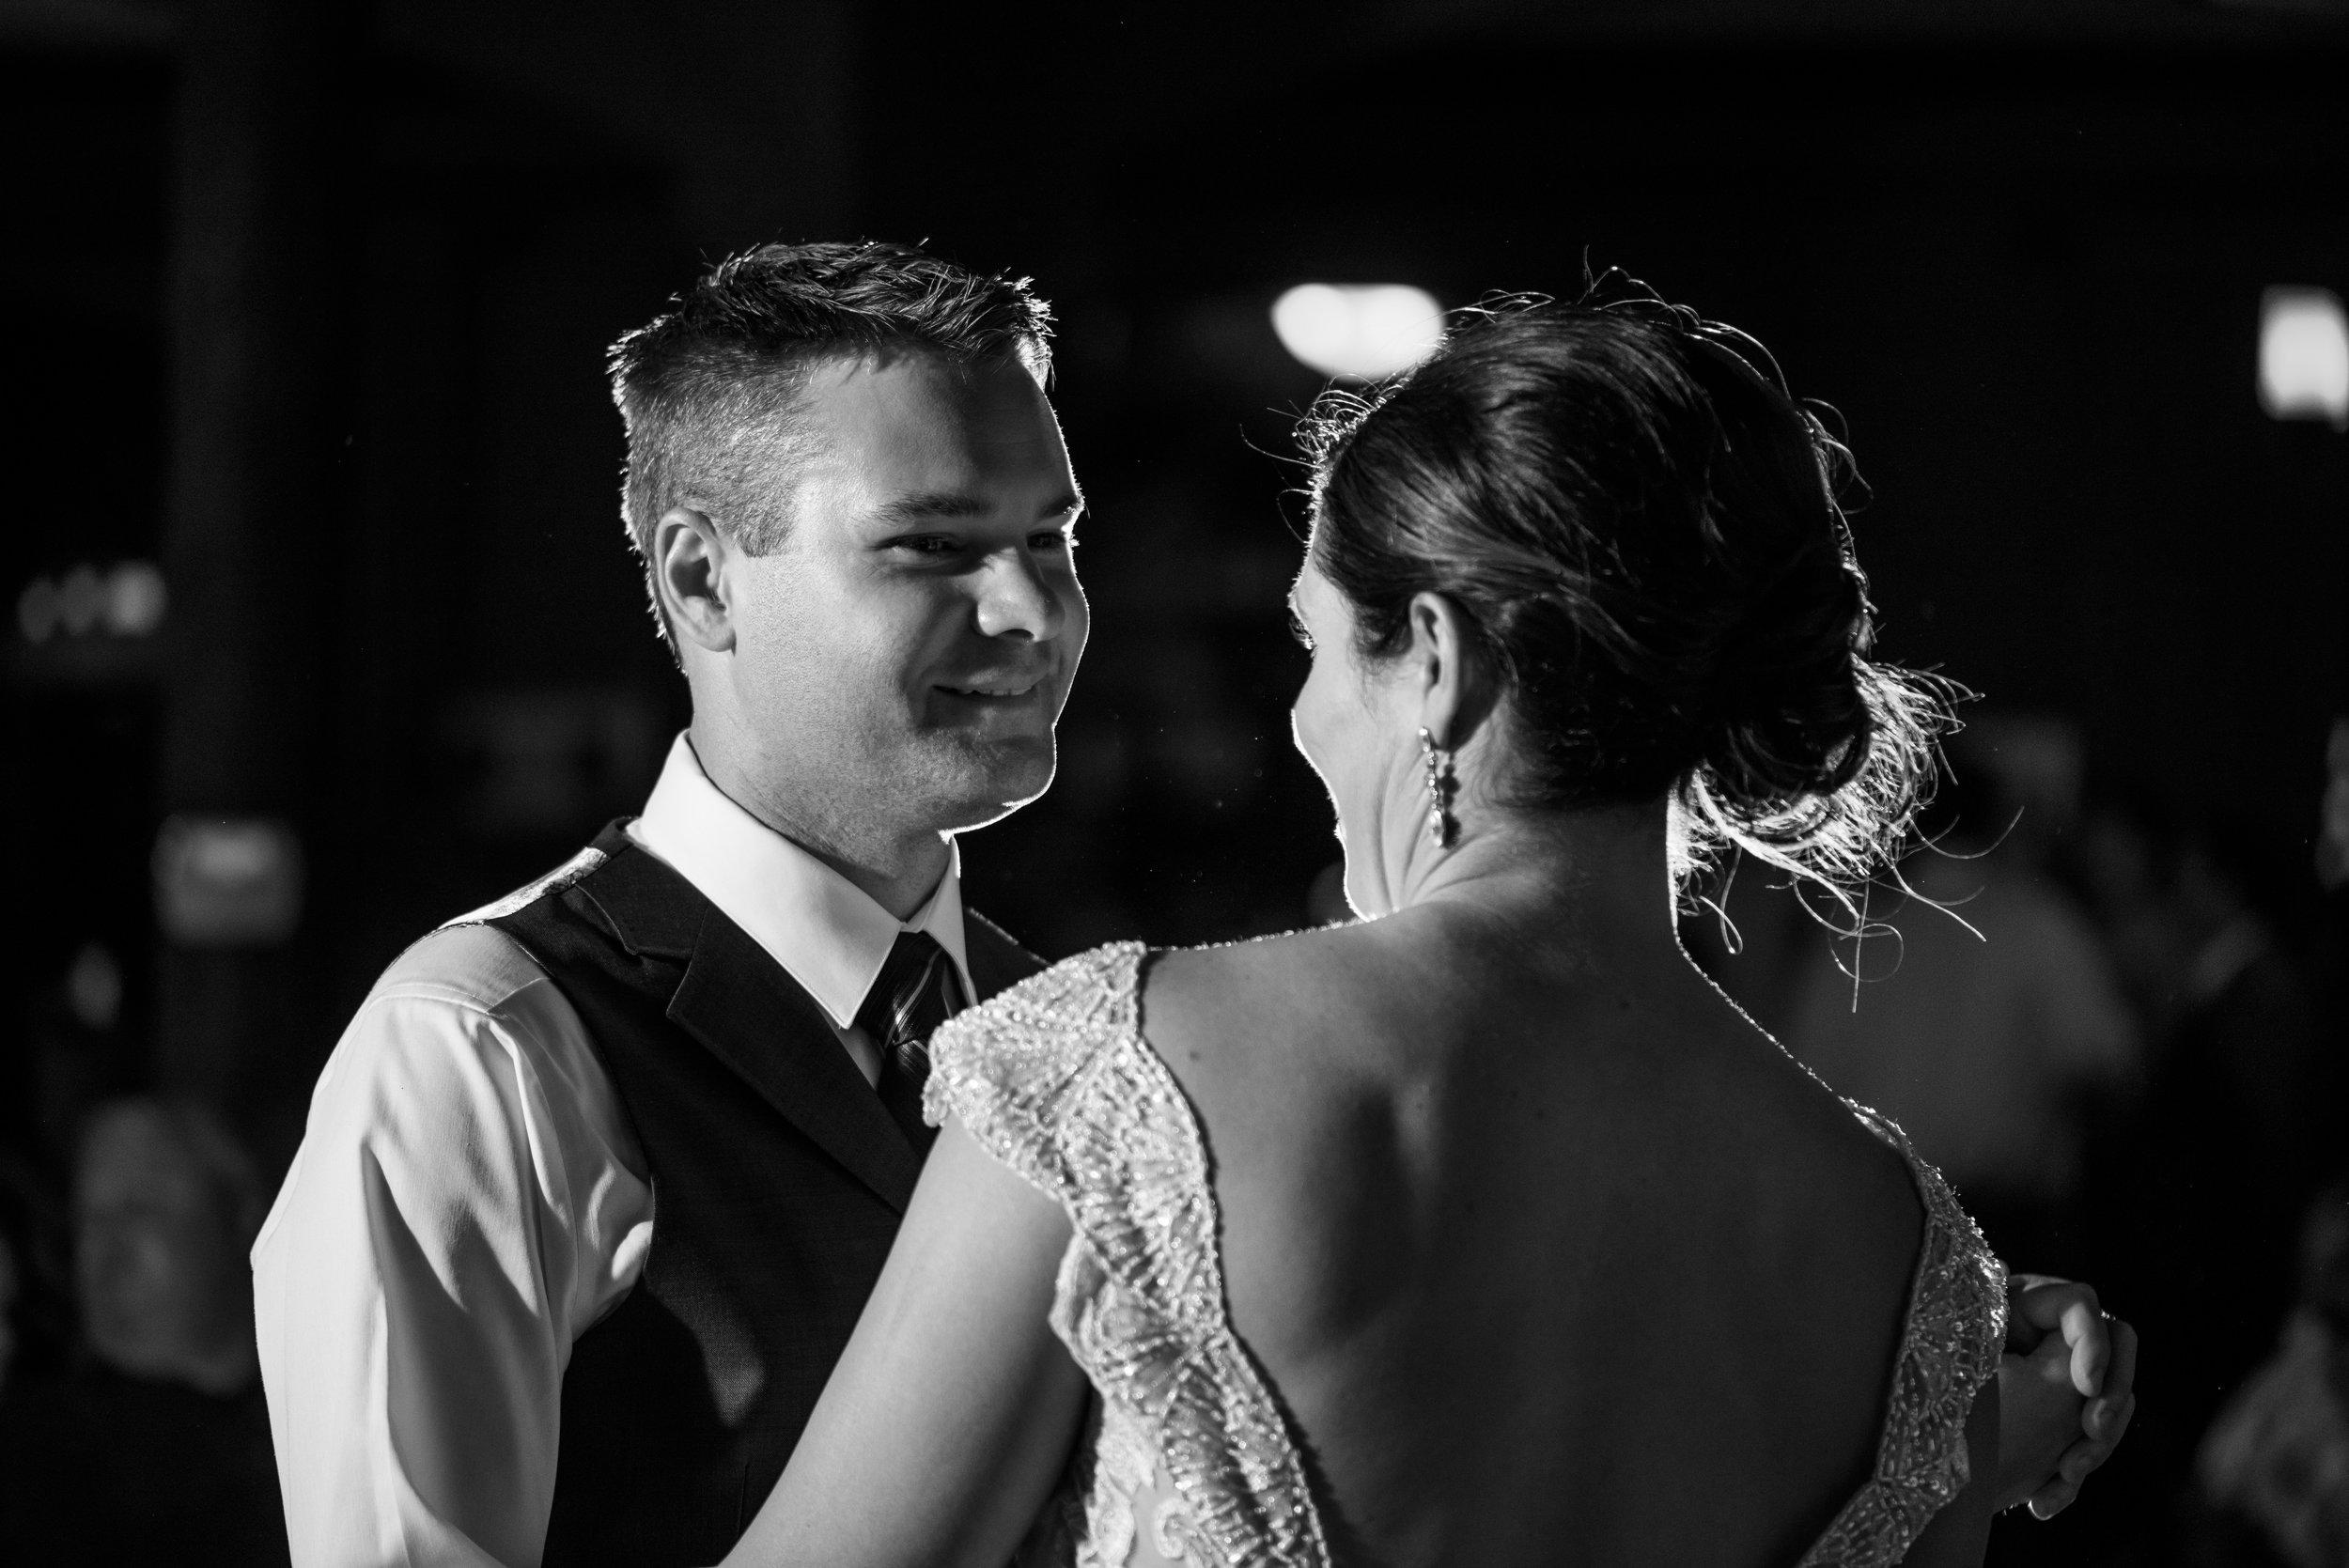 annie-brian-029-antiquite-midtown-sacramento-wedding-photographer-katherine-nicole-photography.JPG